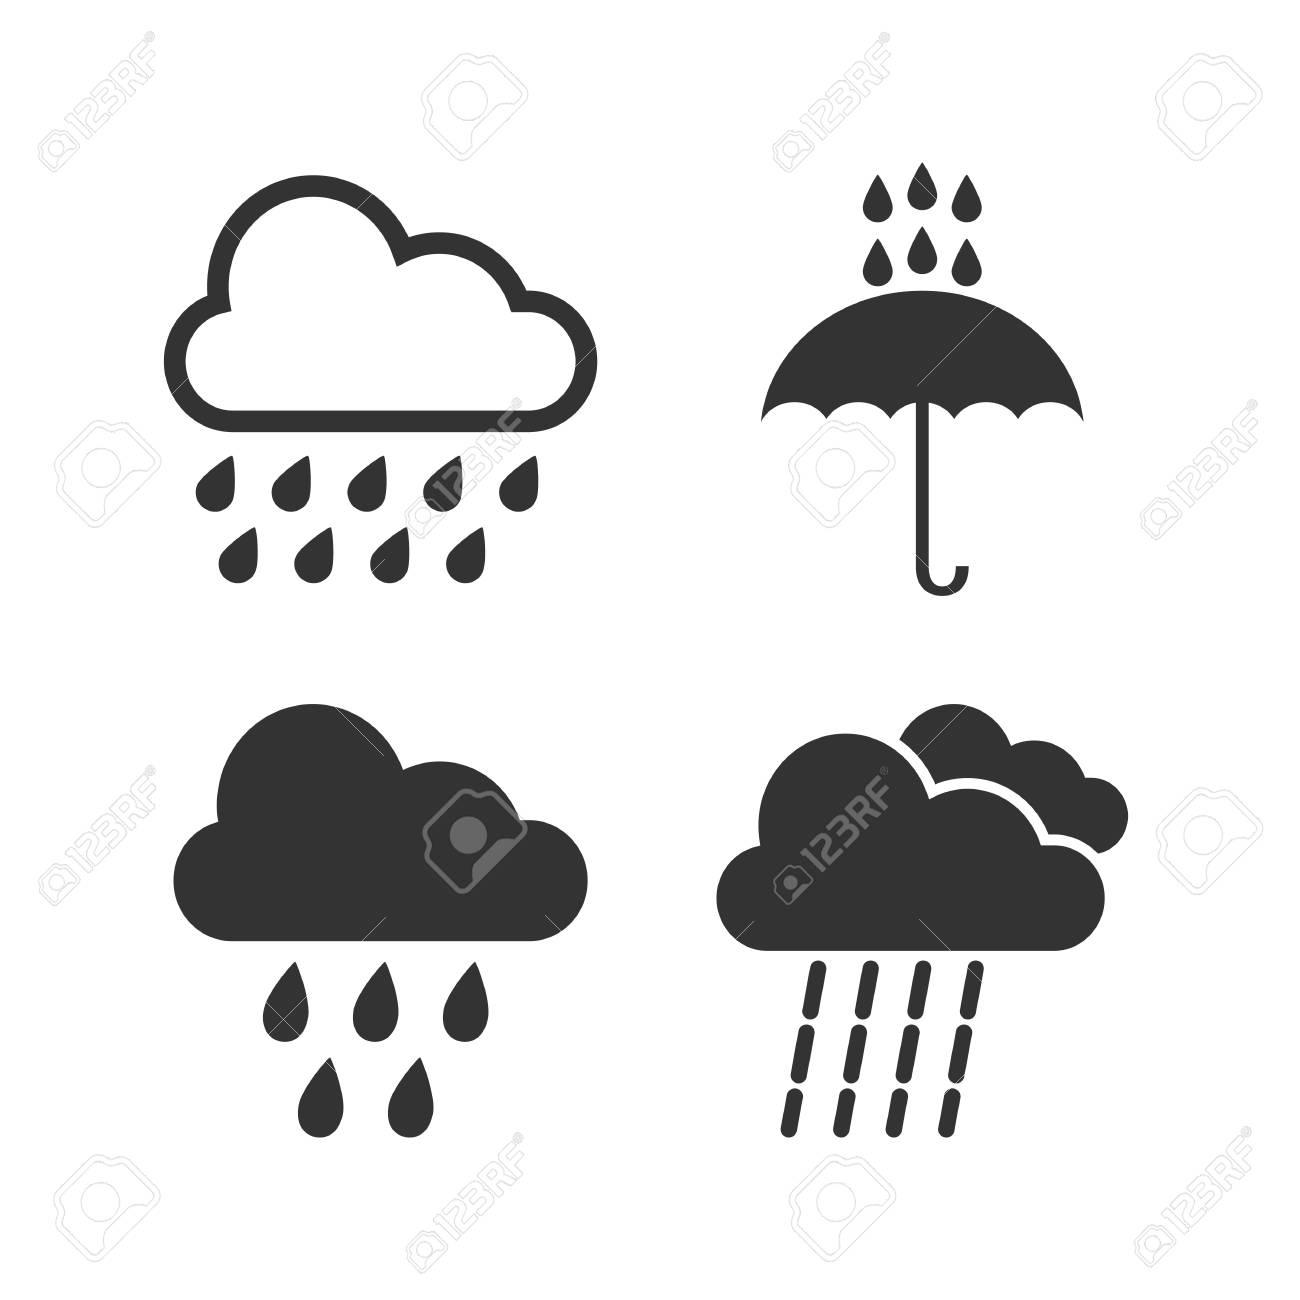 Cloud rain icon  Vector illustrations Flat